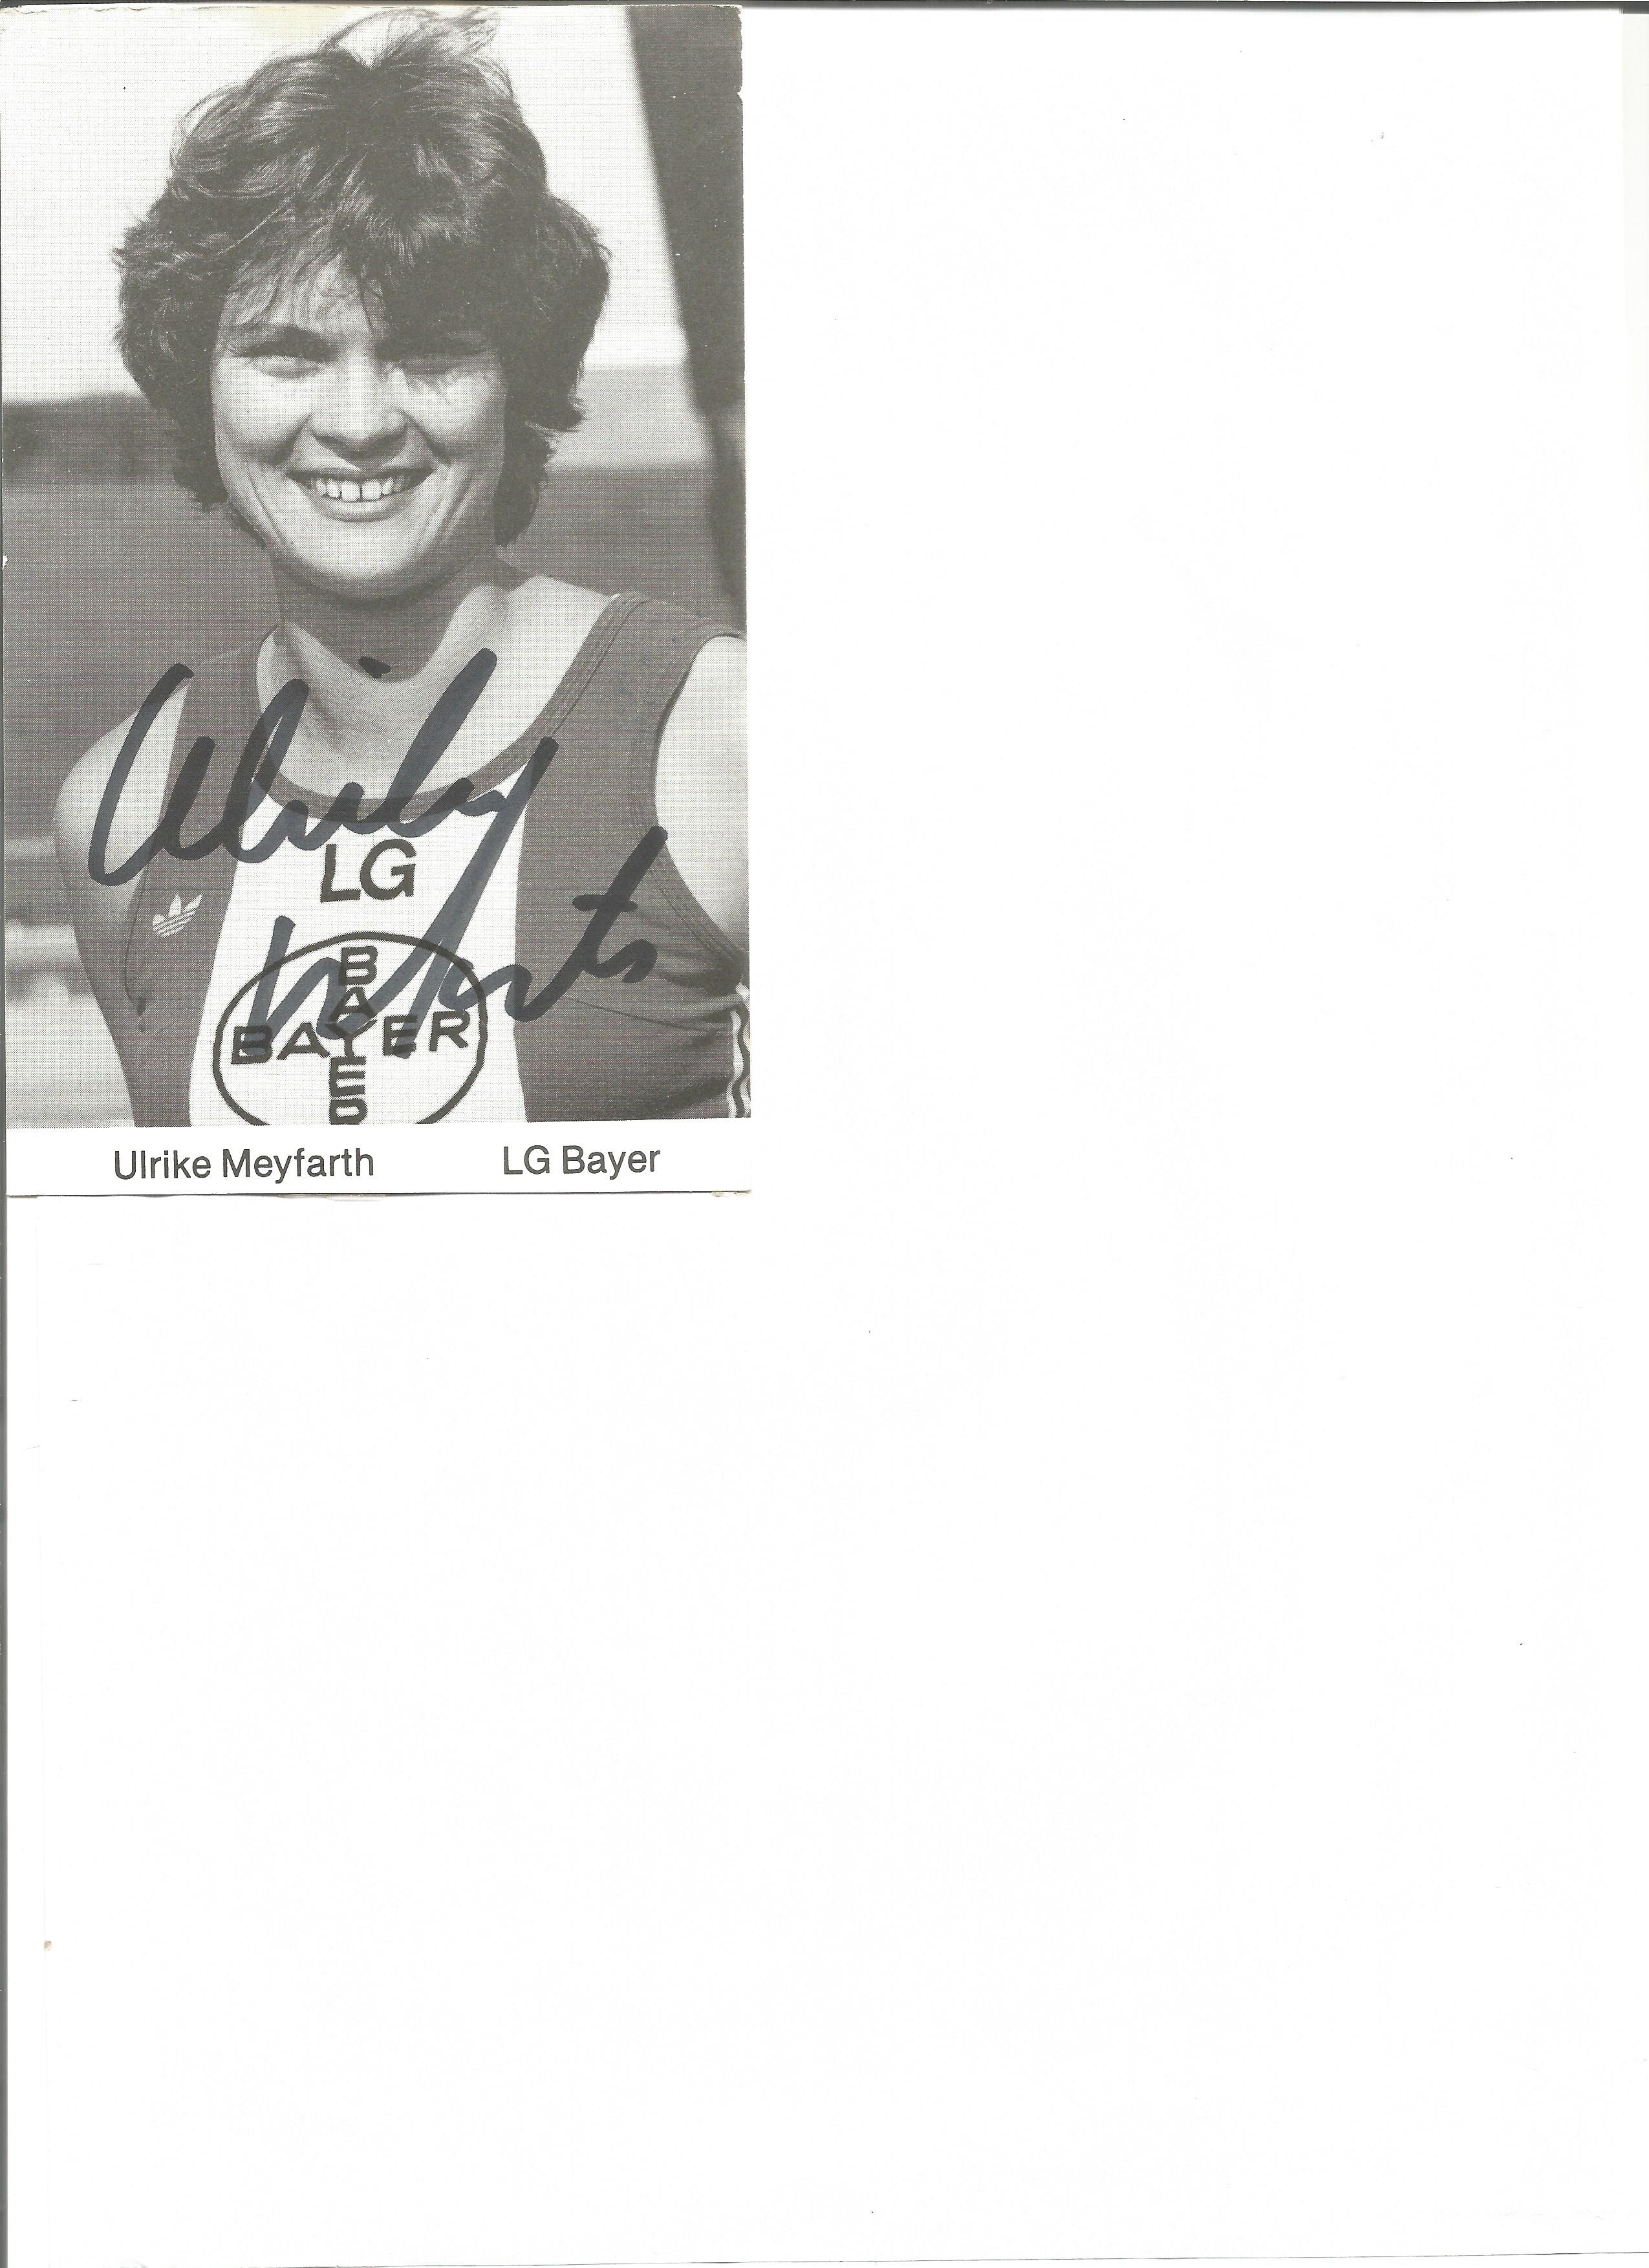 Lot 162 - Athletics Ulrike Meyfarth 6 x 4 inch signed black and white promo photo. Ulrike Nasse-Meyfarth